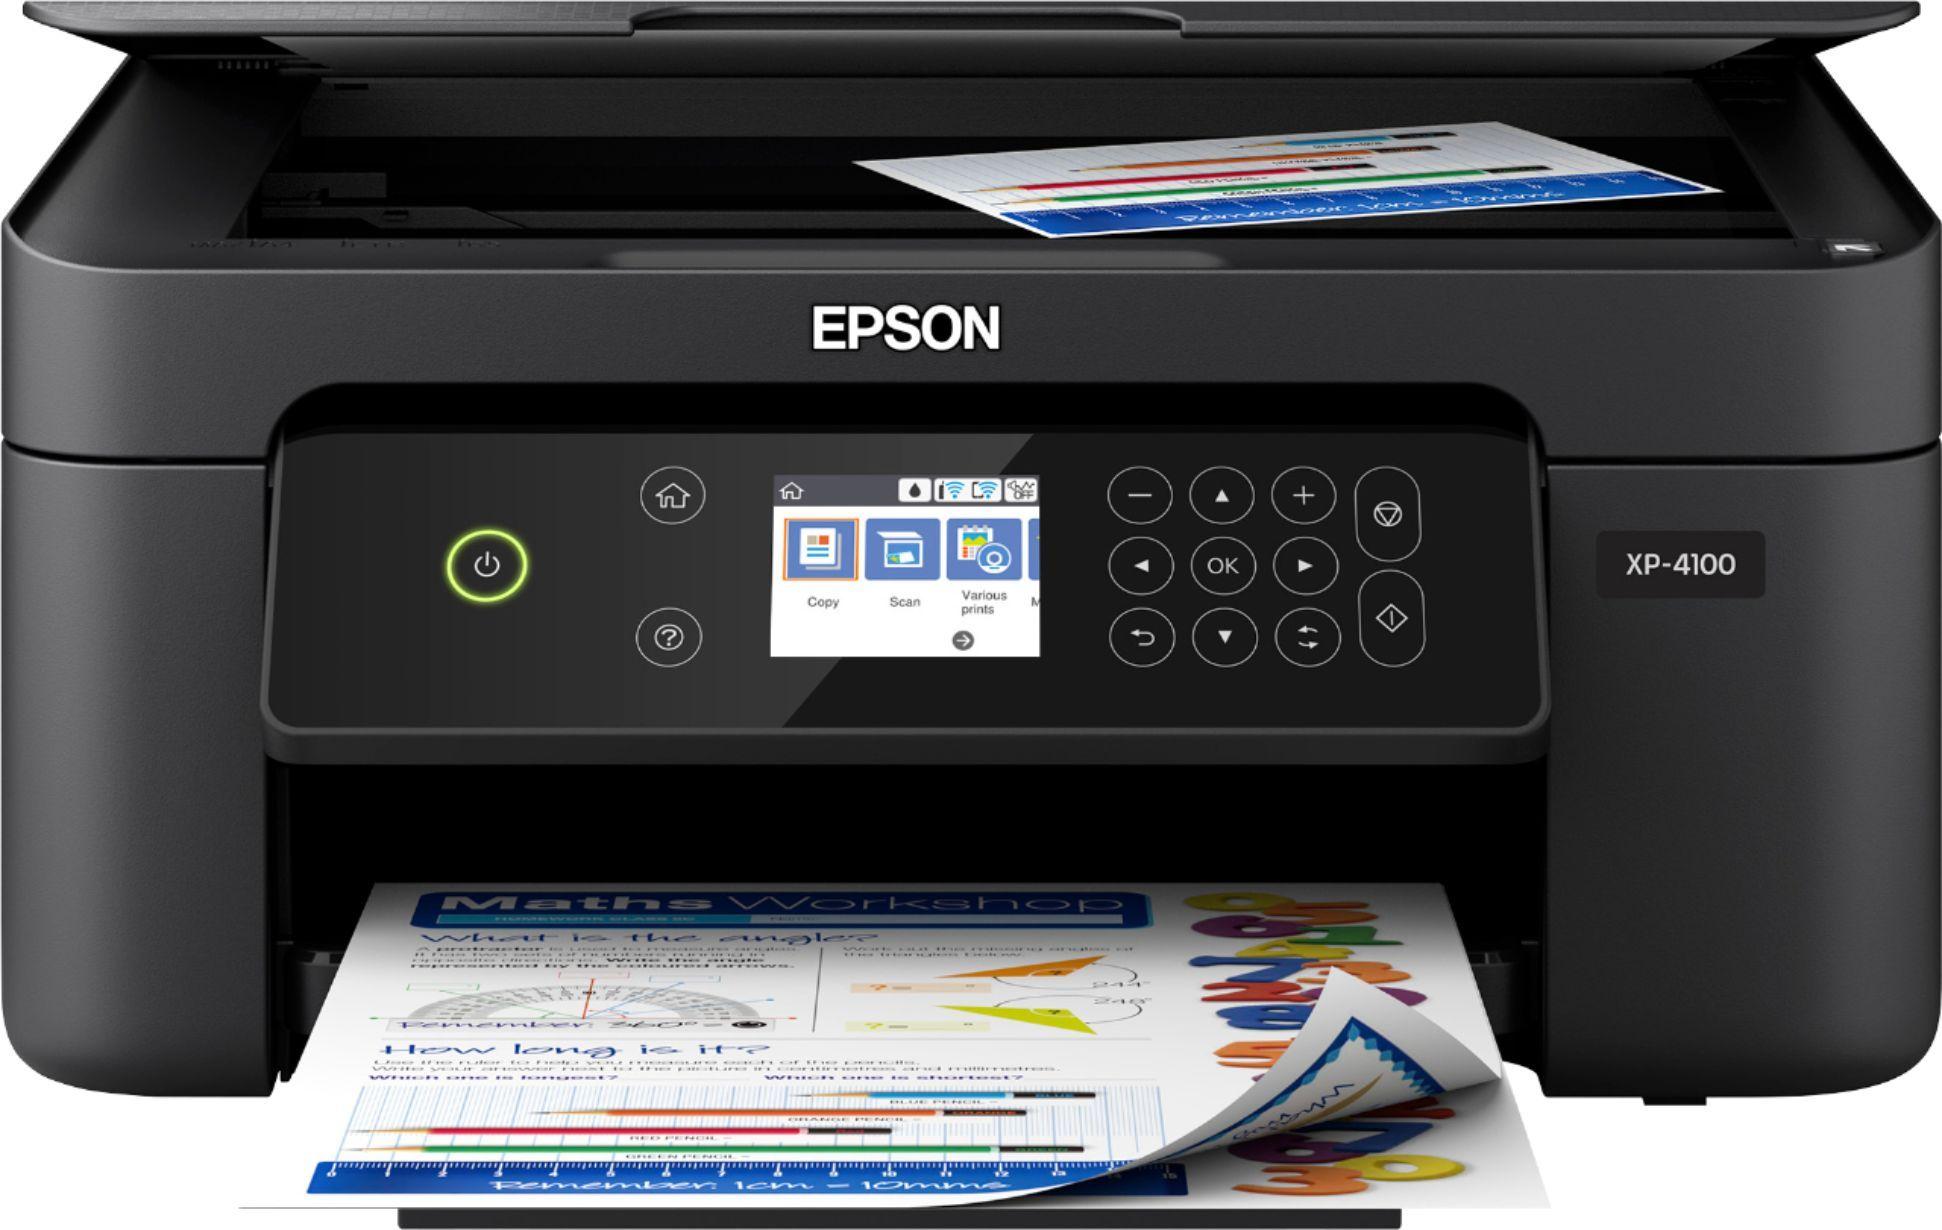 Epson Expression Home Xp 4100 Wireless All In One Inkjet Printer Black Epson Xp 4100 Printer C11cg33 Best Buy Inkjet Printer Epson Epson Printer